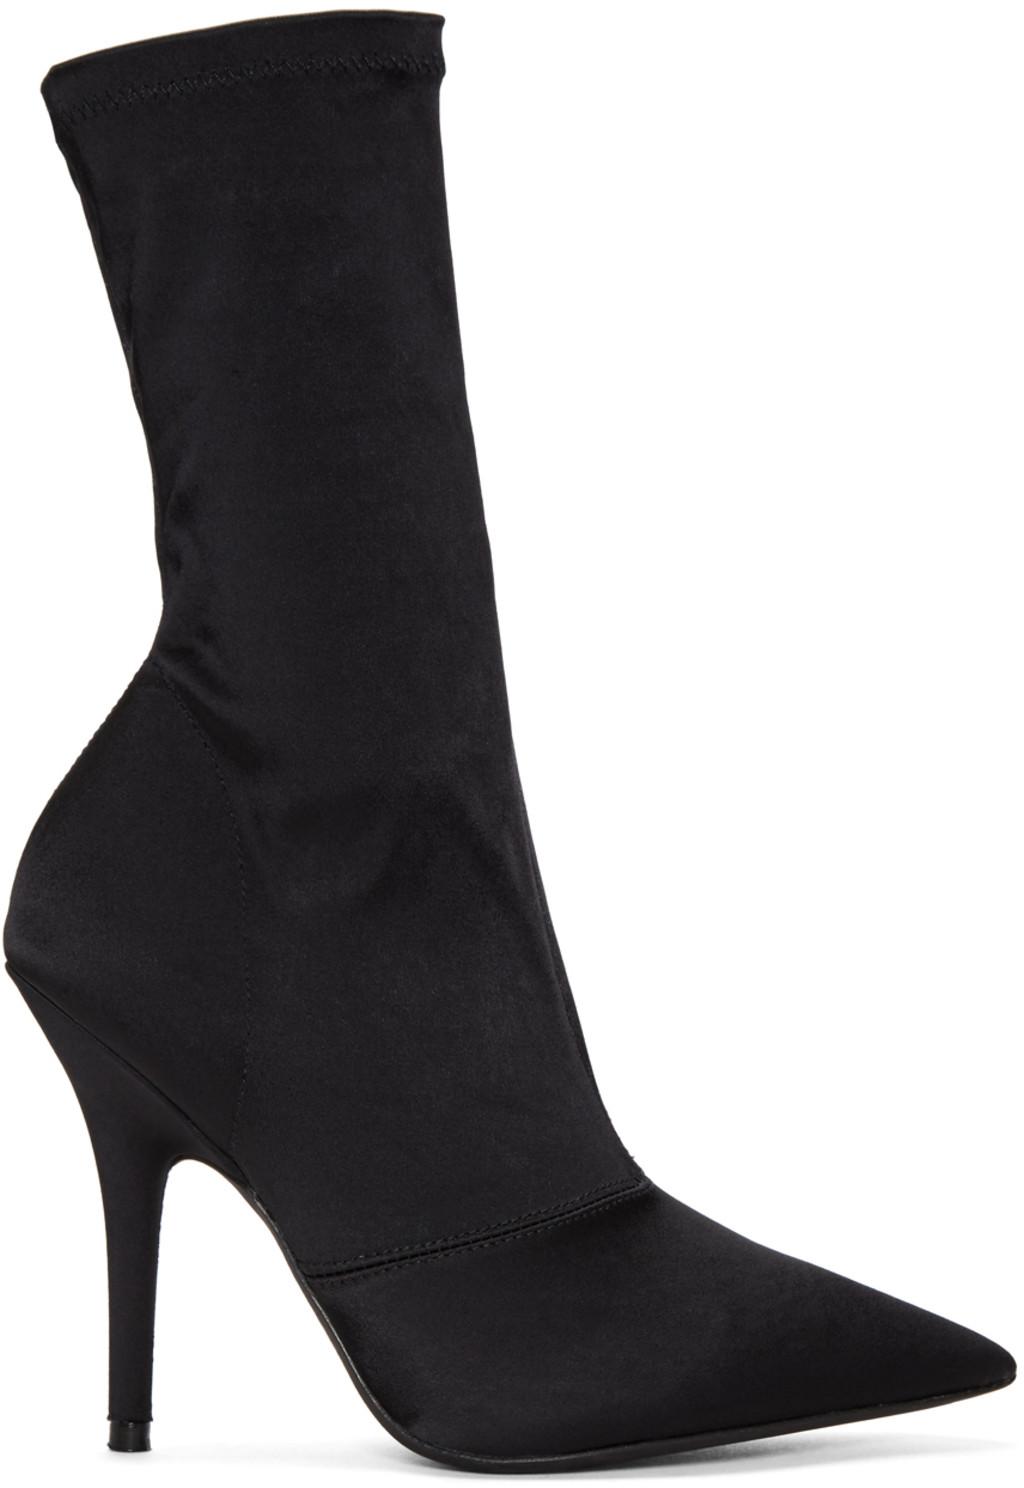 Off-White Black Broken Heel Boots sjbaByDByN